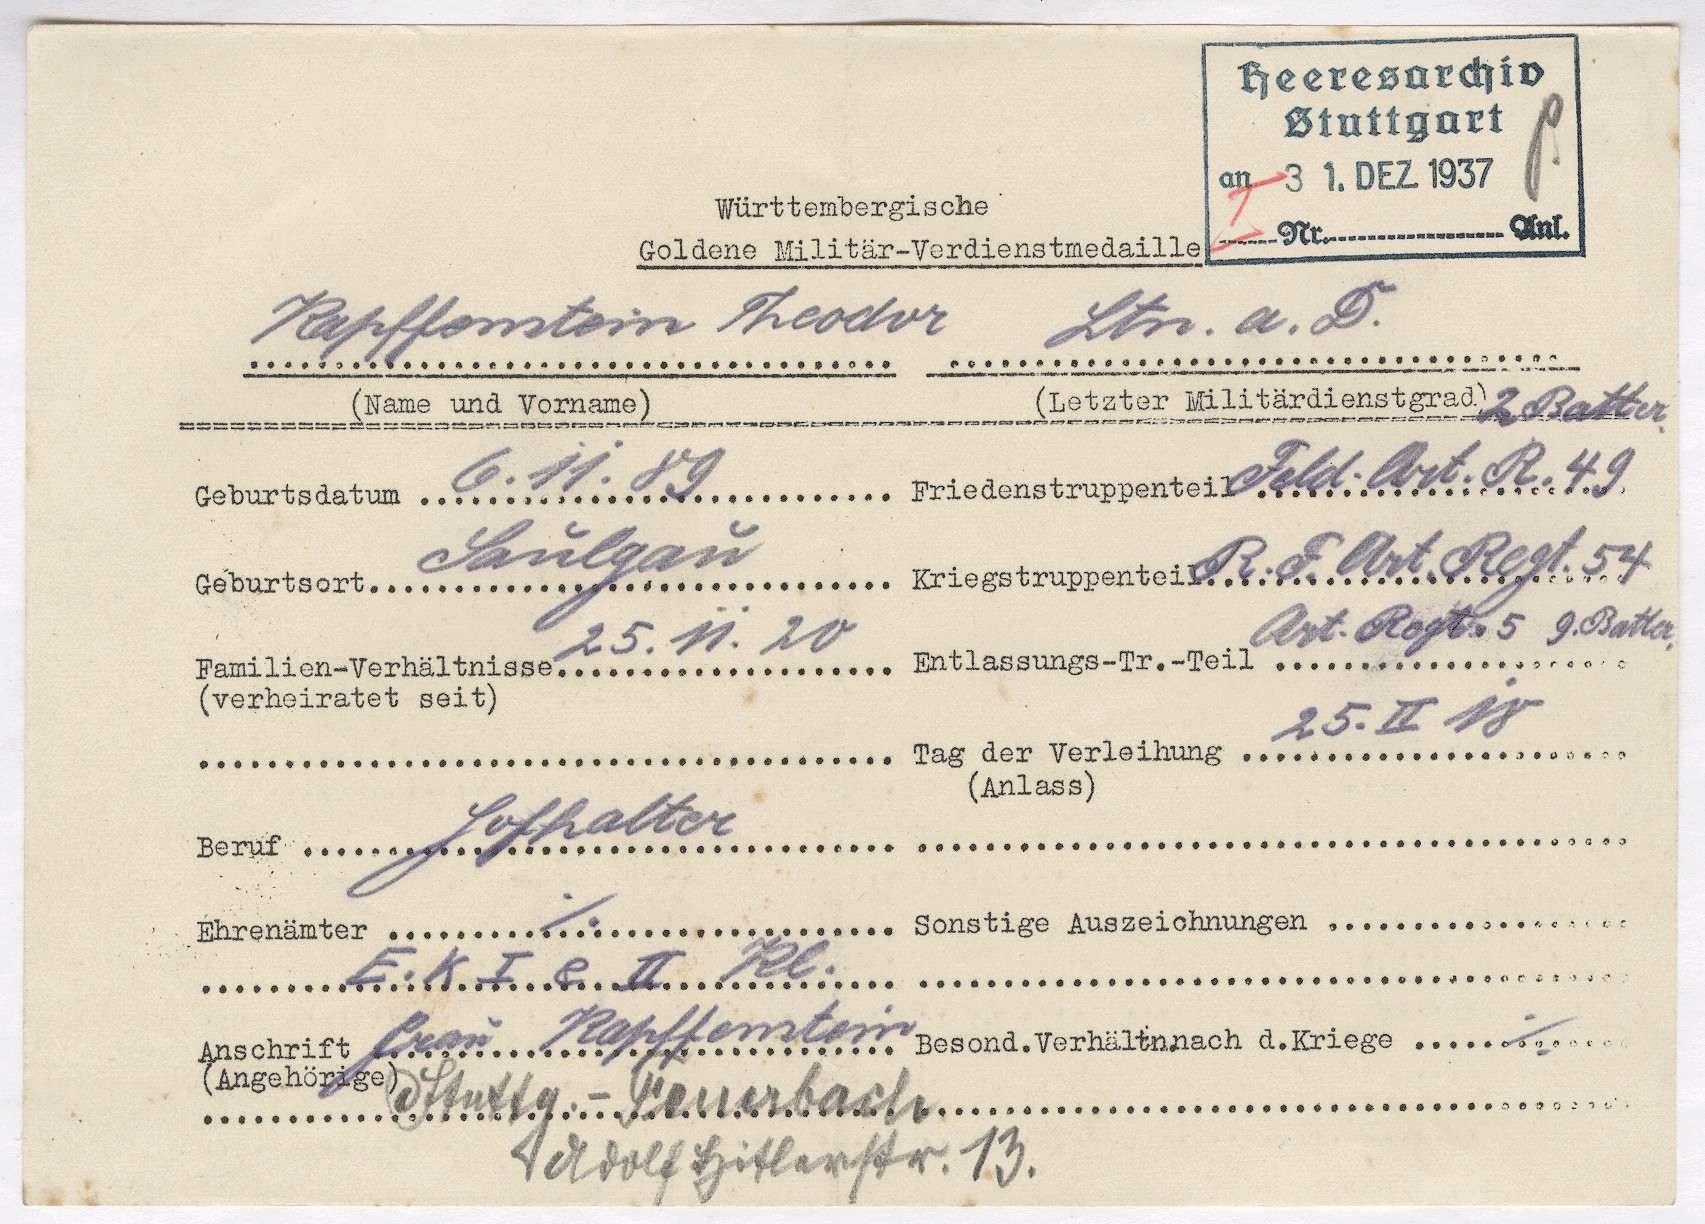 Kapffenstein, Theodor, Bild 2